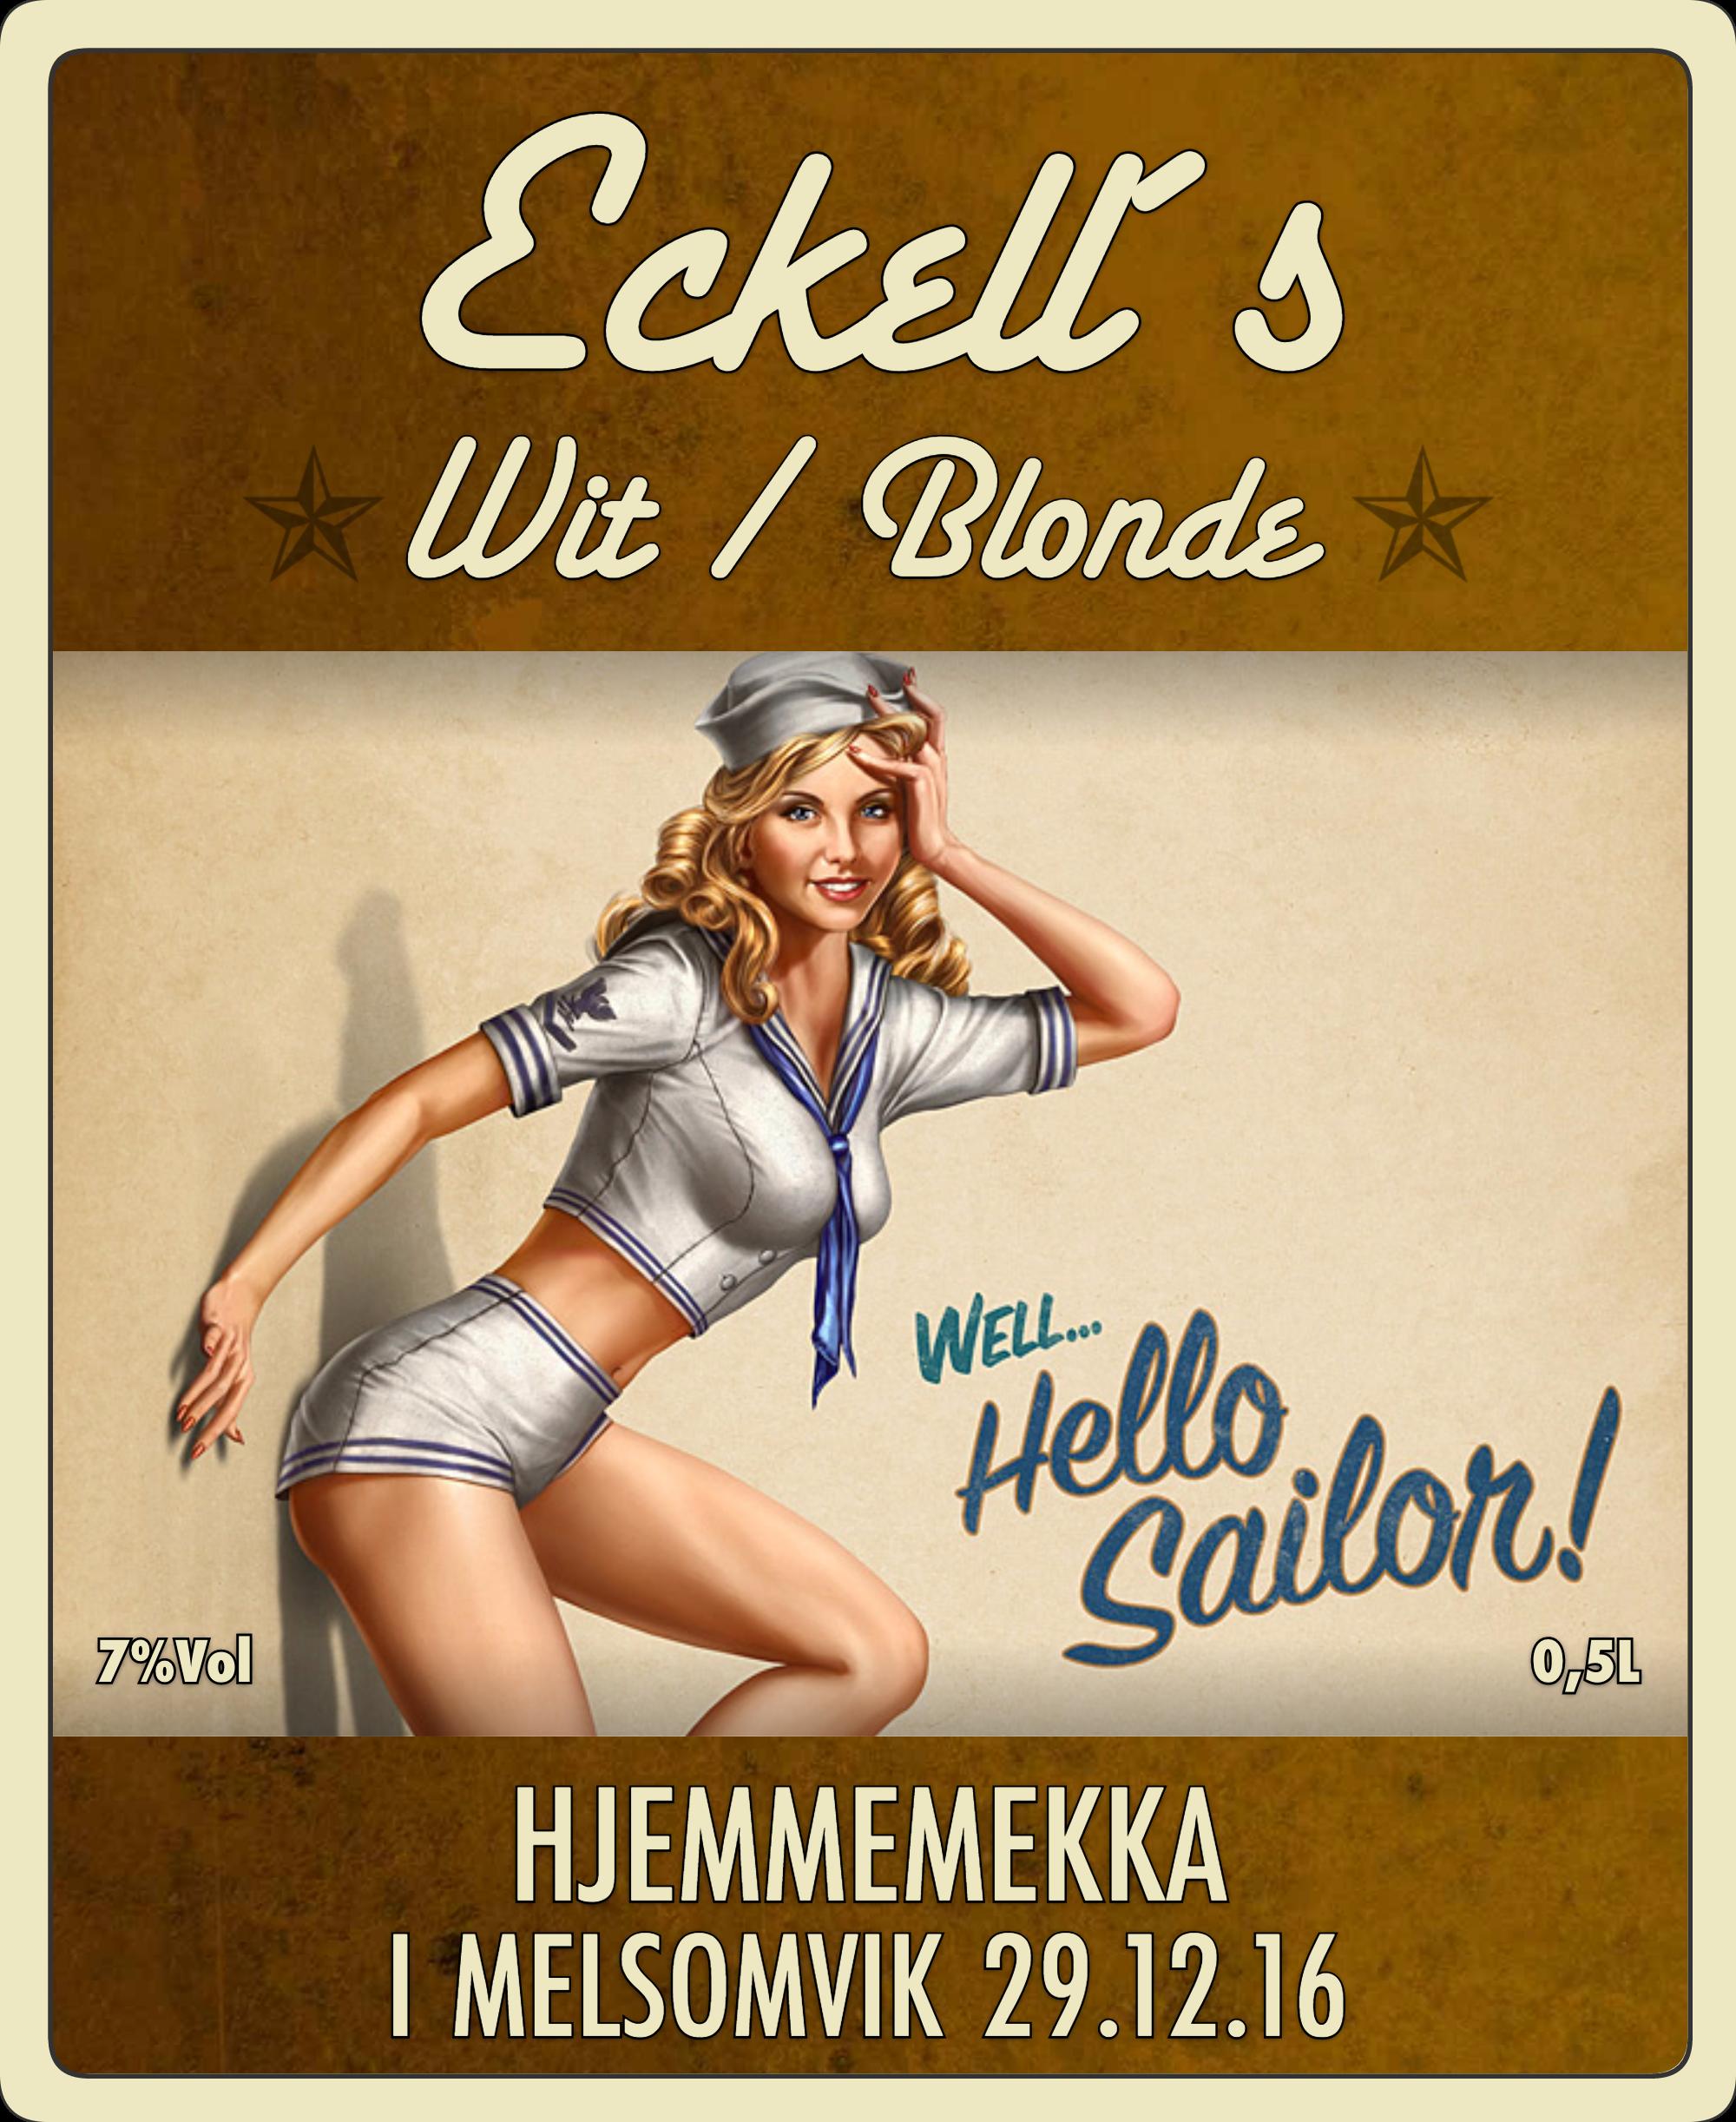 wit blonde – Fossnes Nano bryggeri